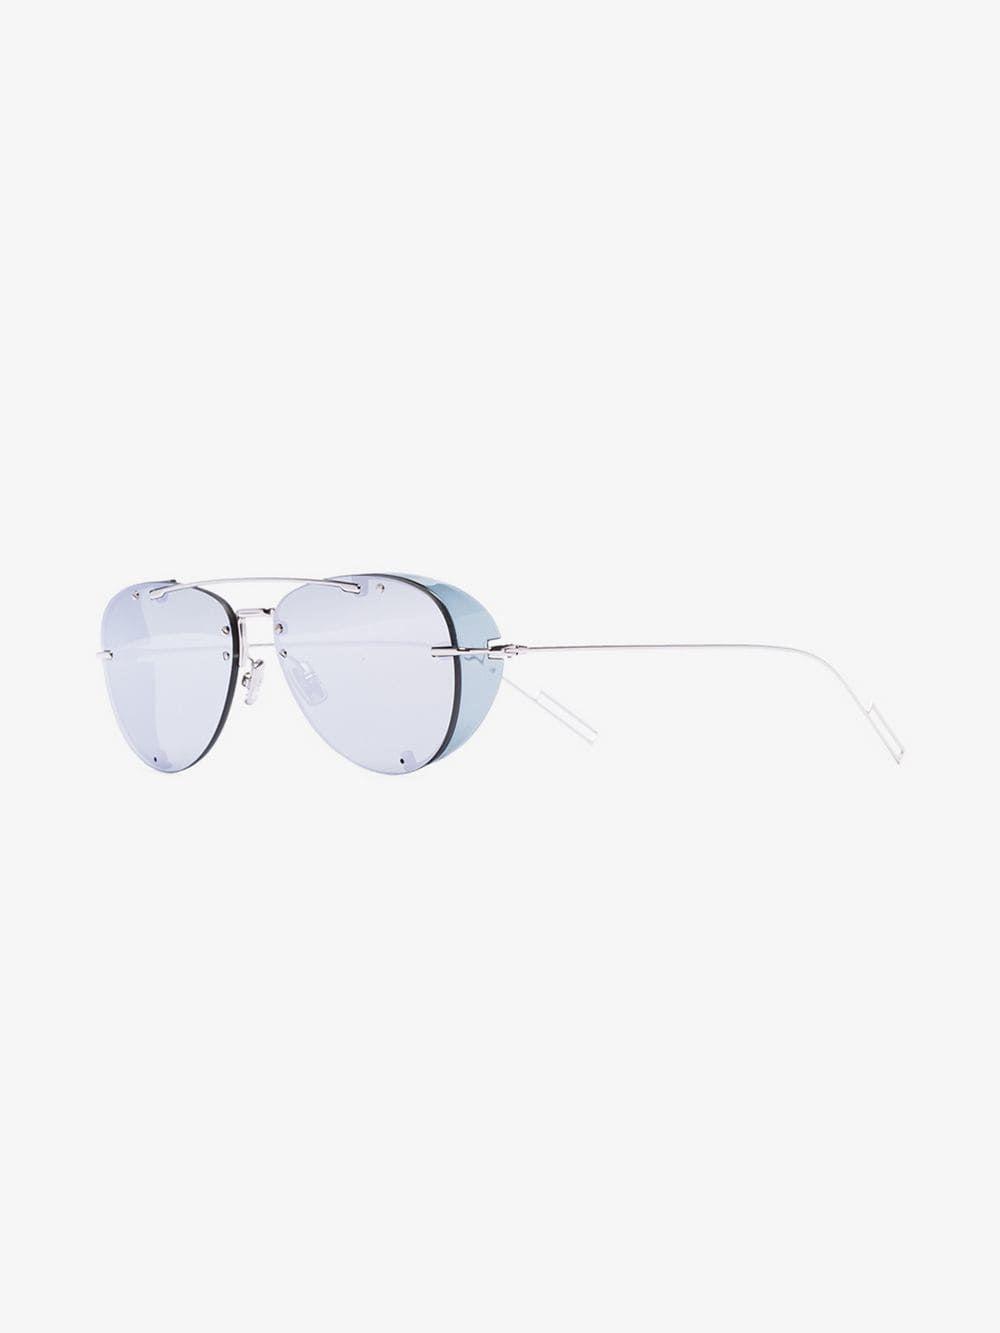 5354a52c89e2 DIOR DIOR EYEWEAR DIOR CHROMA1 SUNG SILV. #dior Mirrored Sunglasses, Eyewear,  Dior